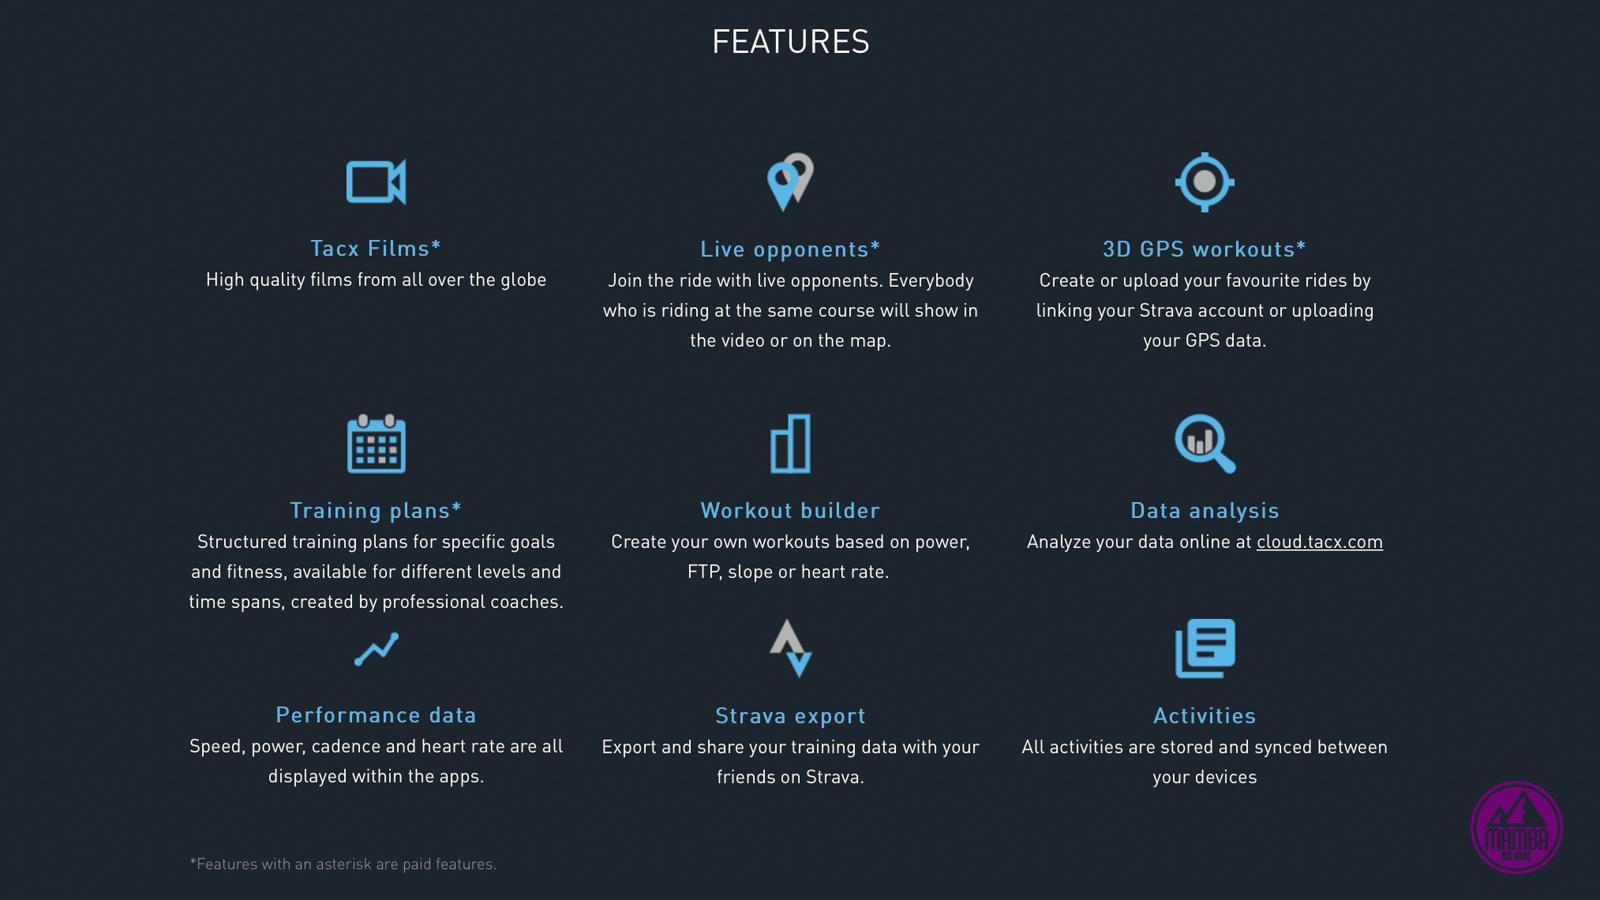 Tacx Desktop App features